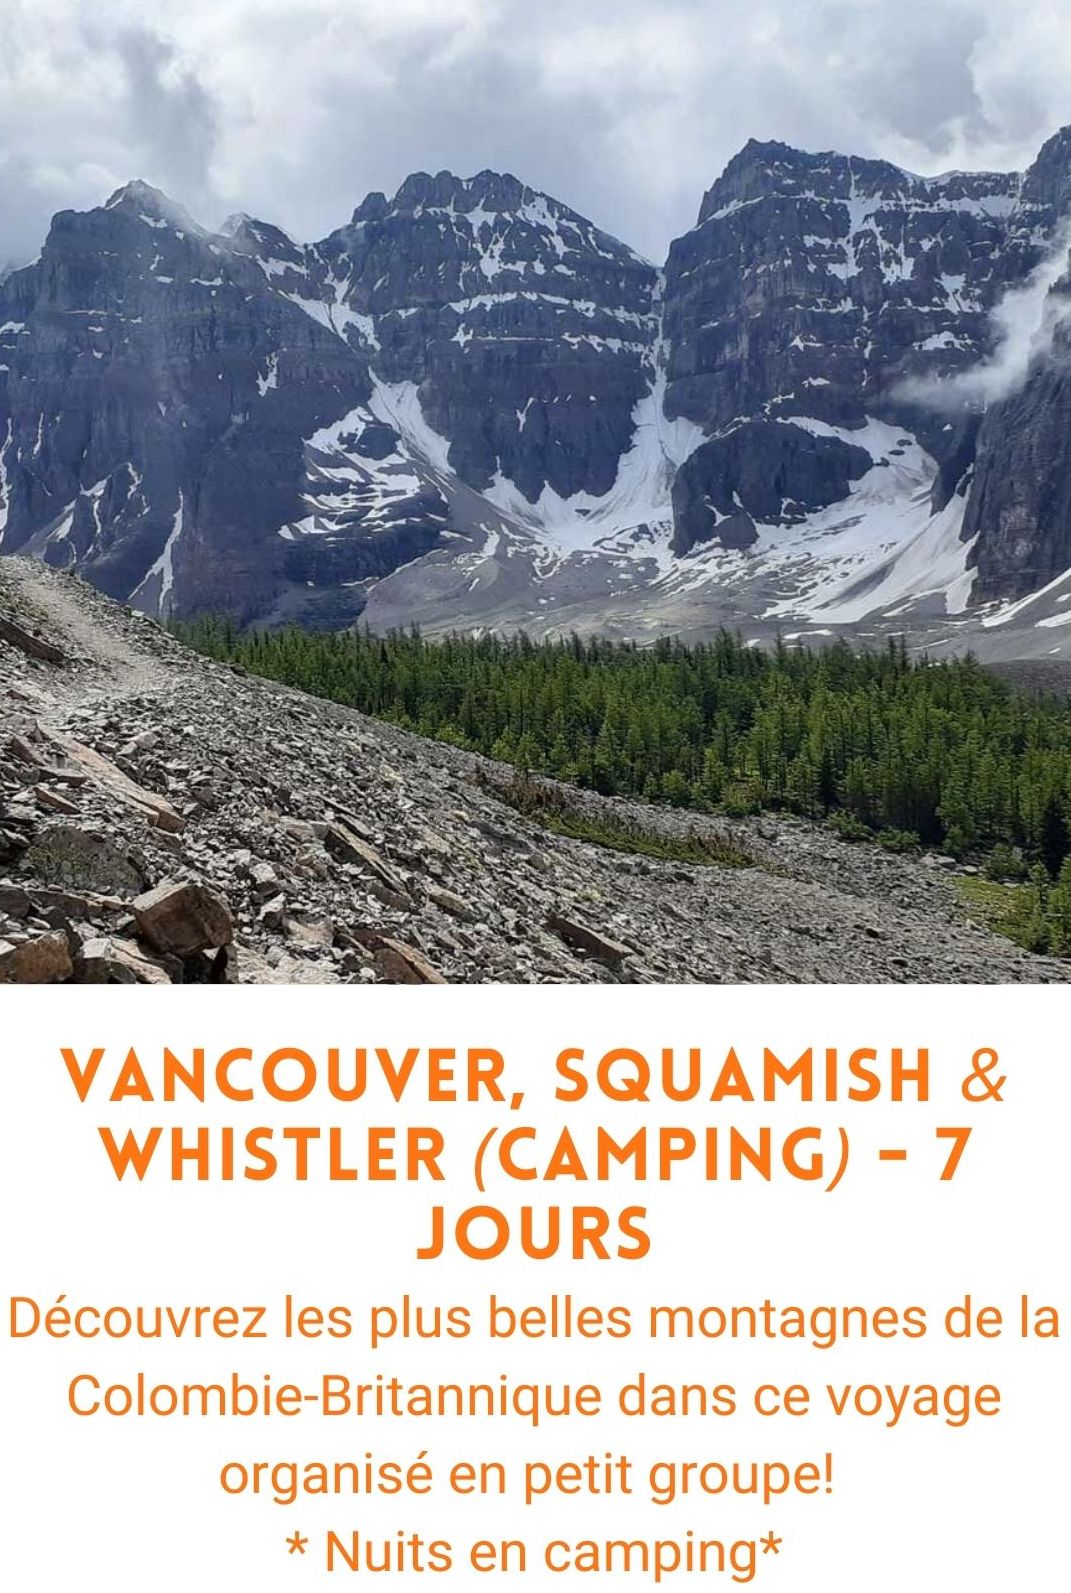 voyage organisé Vancouver, Squamish, Whistler